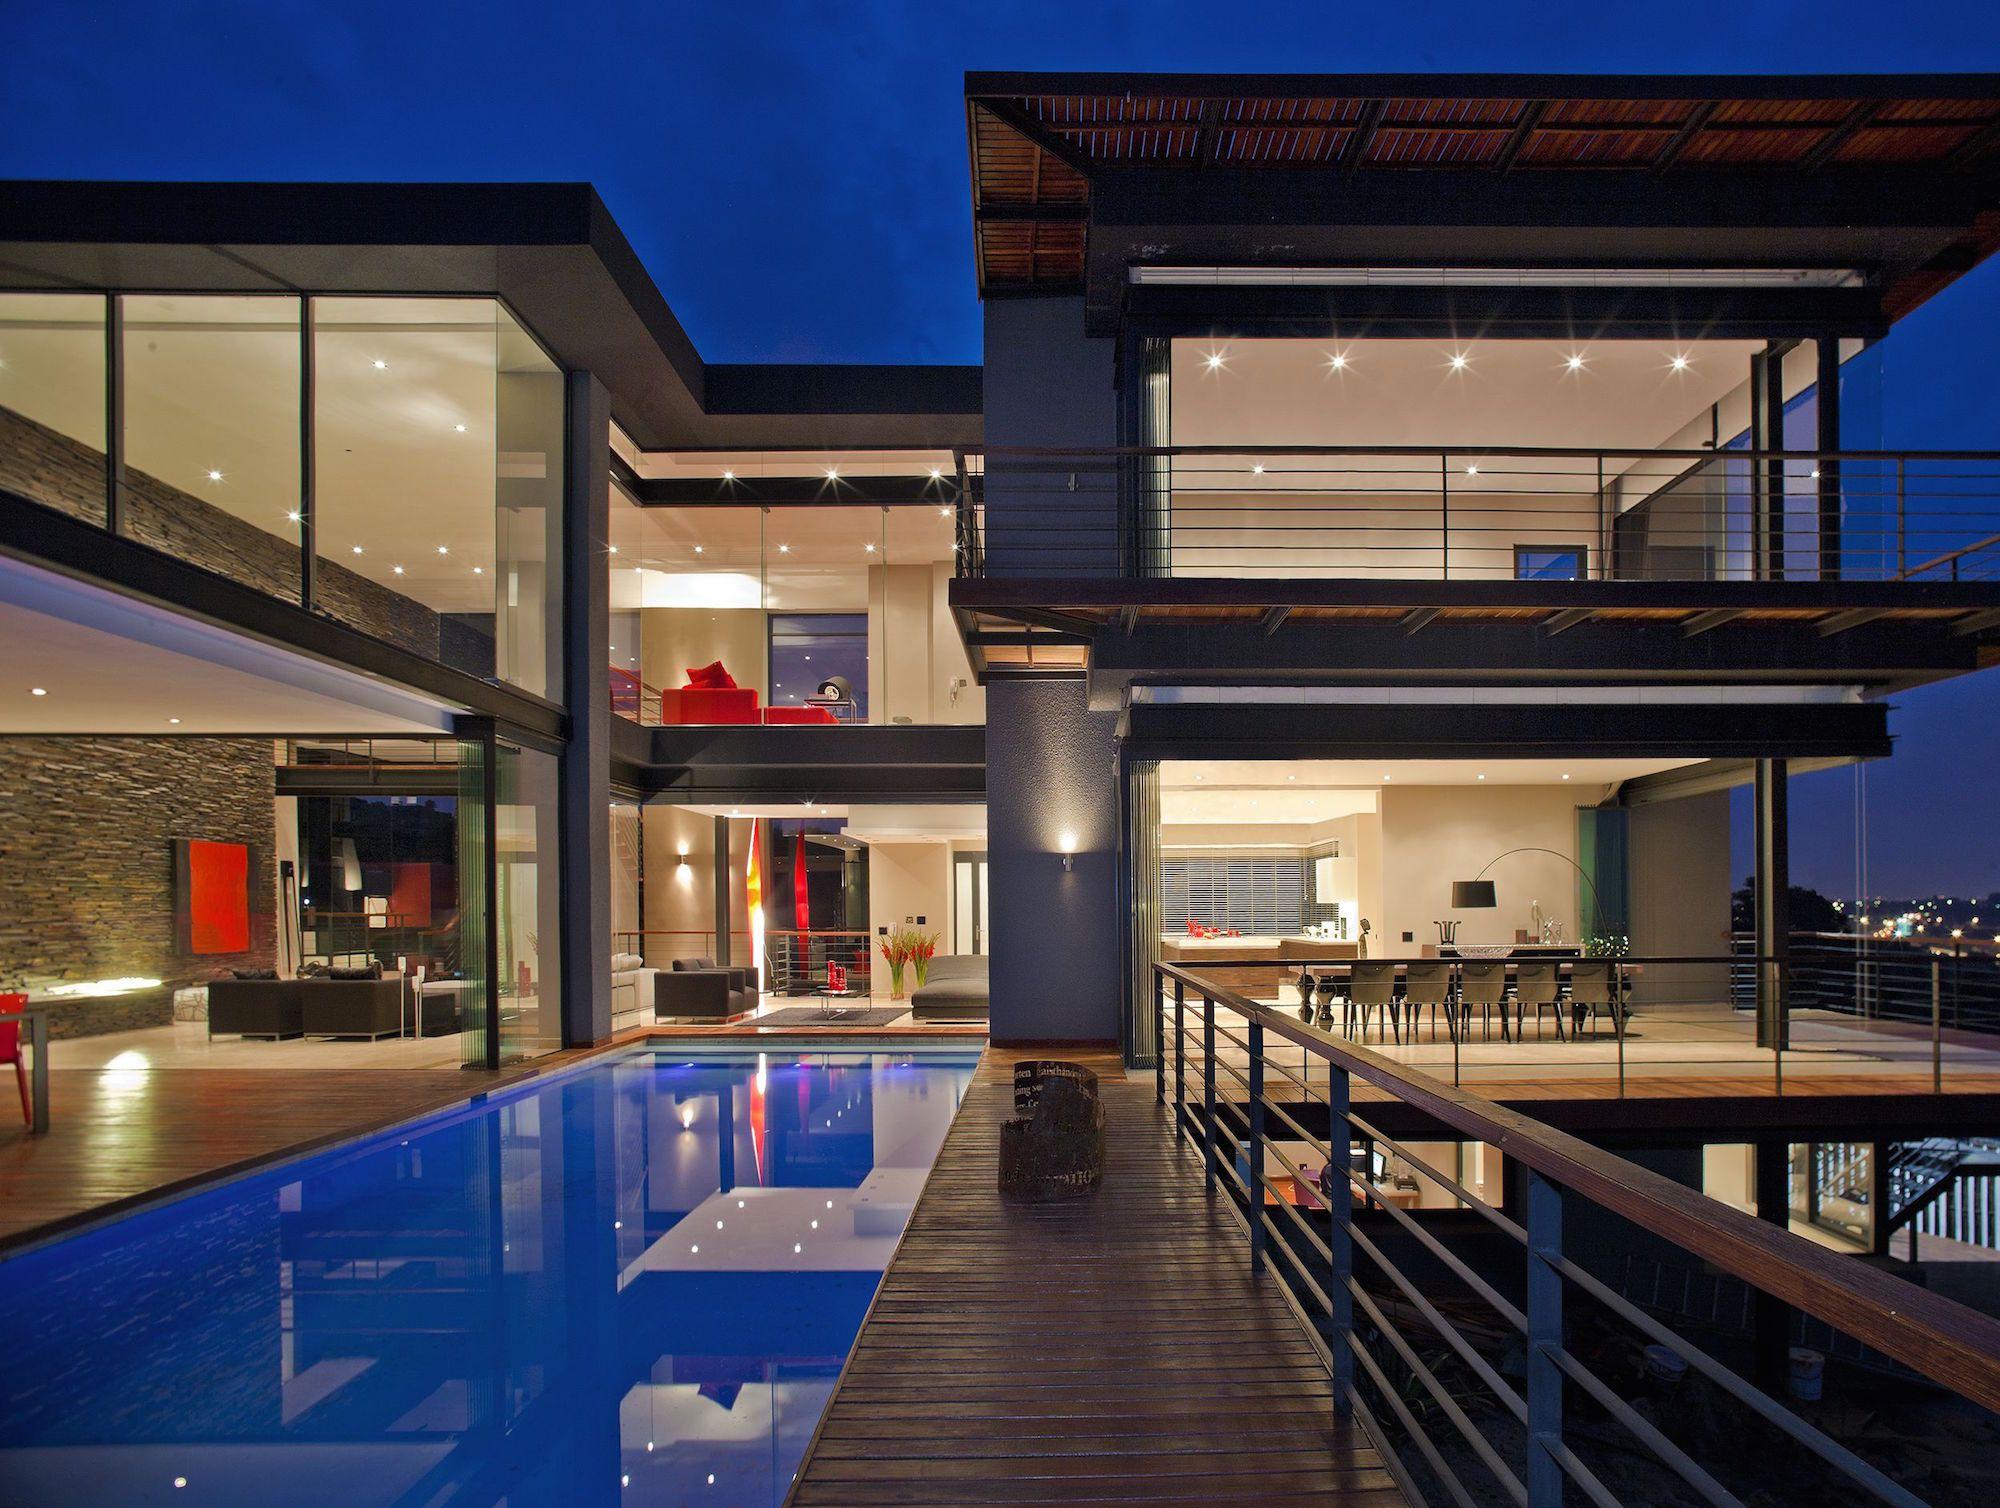 1Nico VD Meulen House Limbarda exterior nite Pan lookinginto house 1